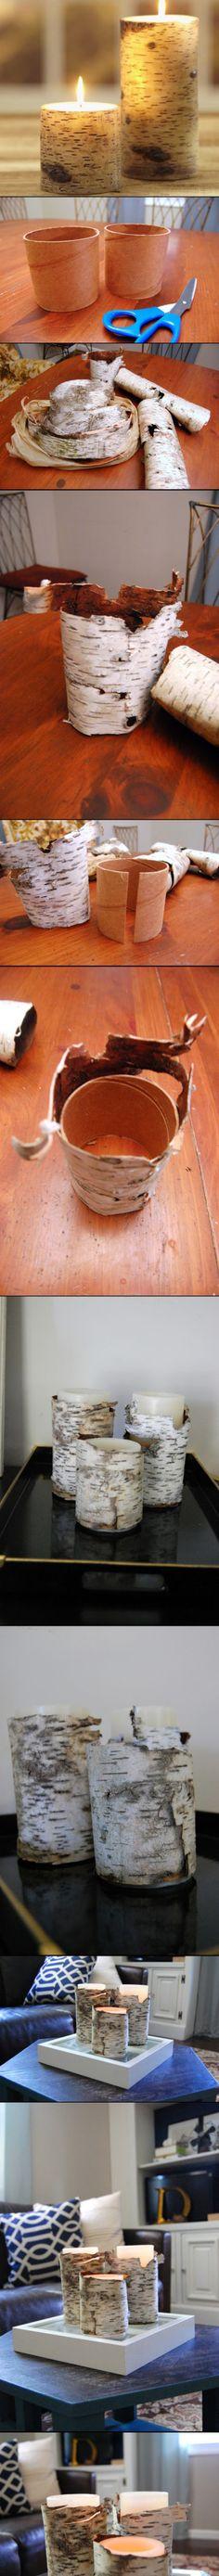 DIY Birch Bark Candles | #DIY